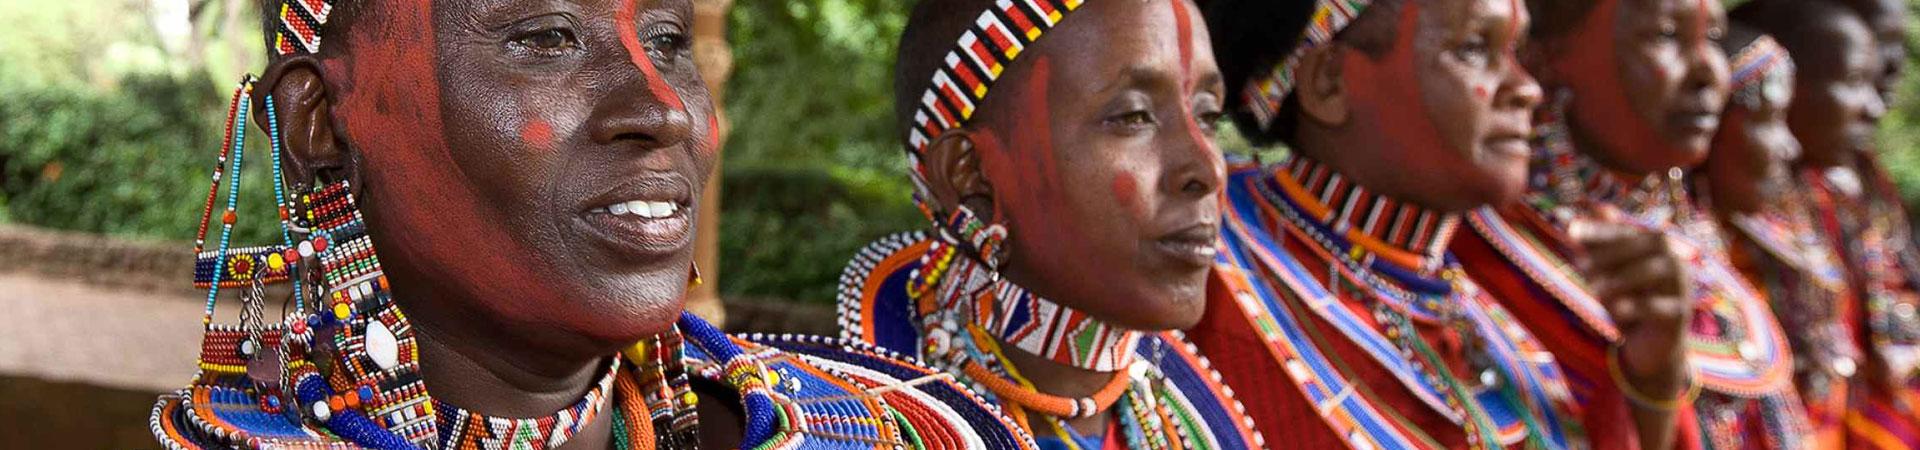 Maasai-Cultural-Tribe